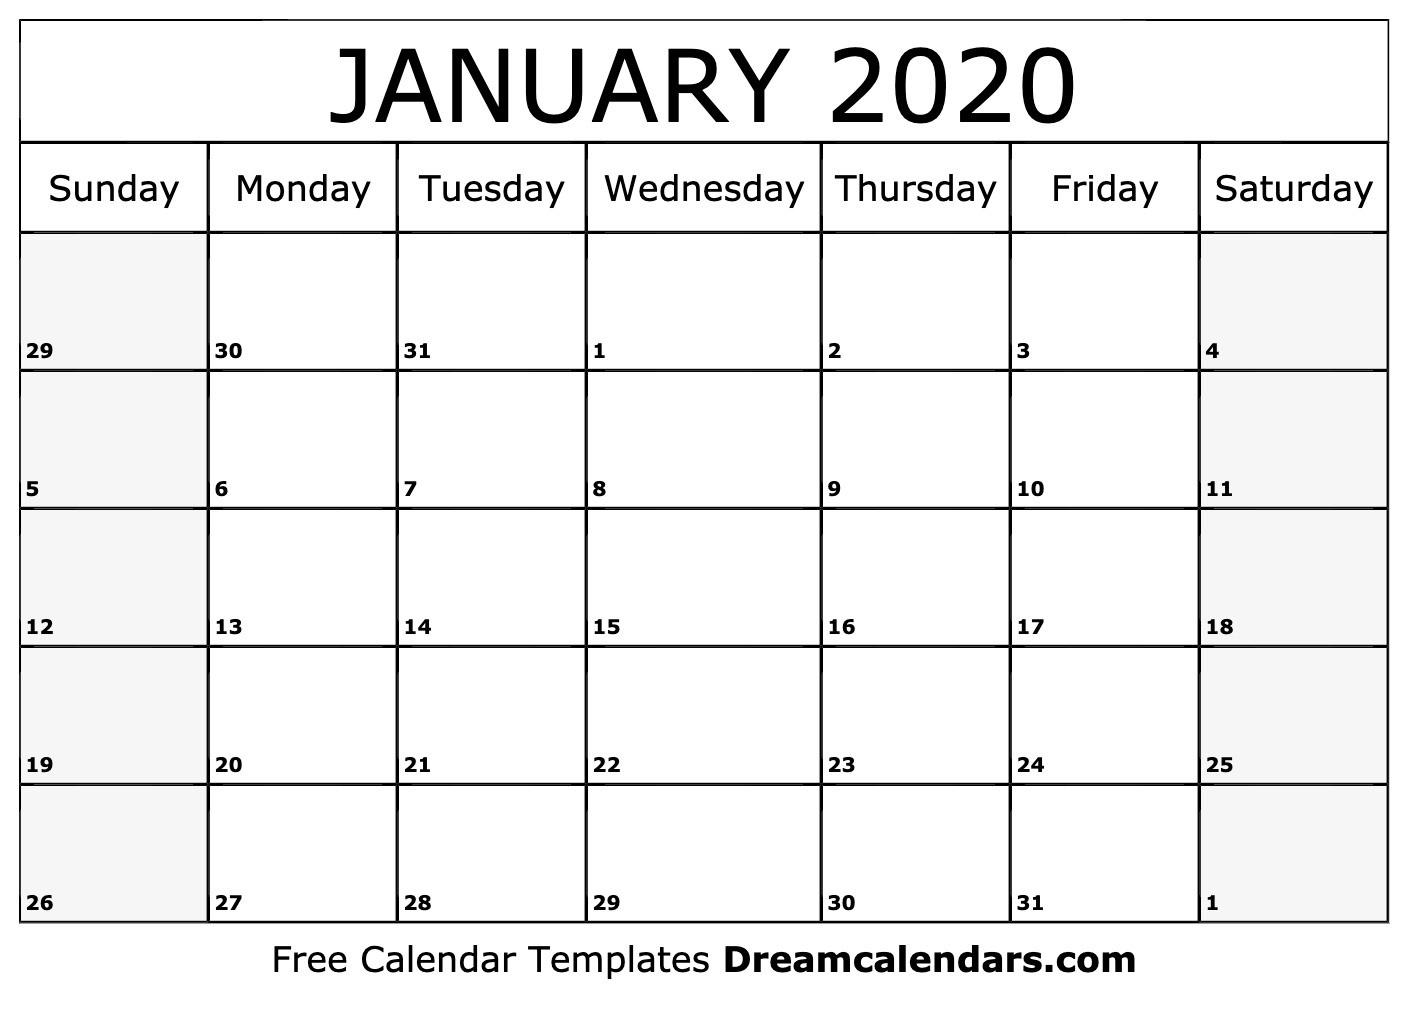 Dream Calendars - Make Your Calendar Template Blog-Jewish Calendar January 2020